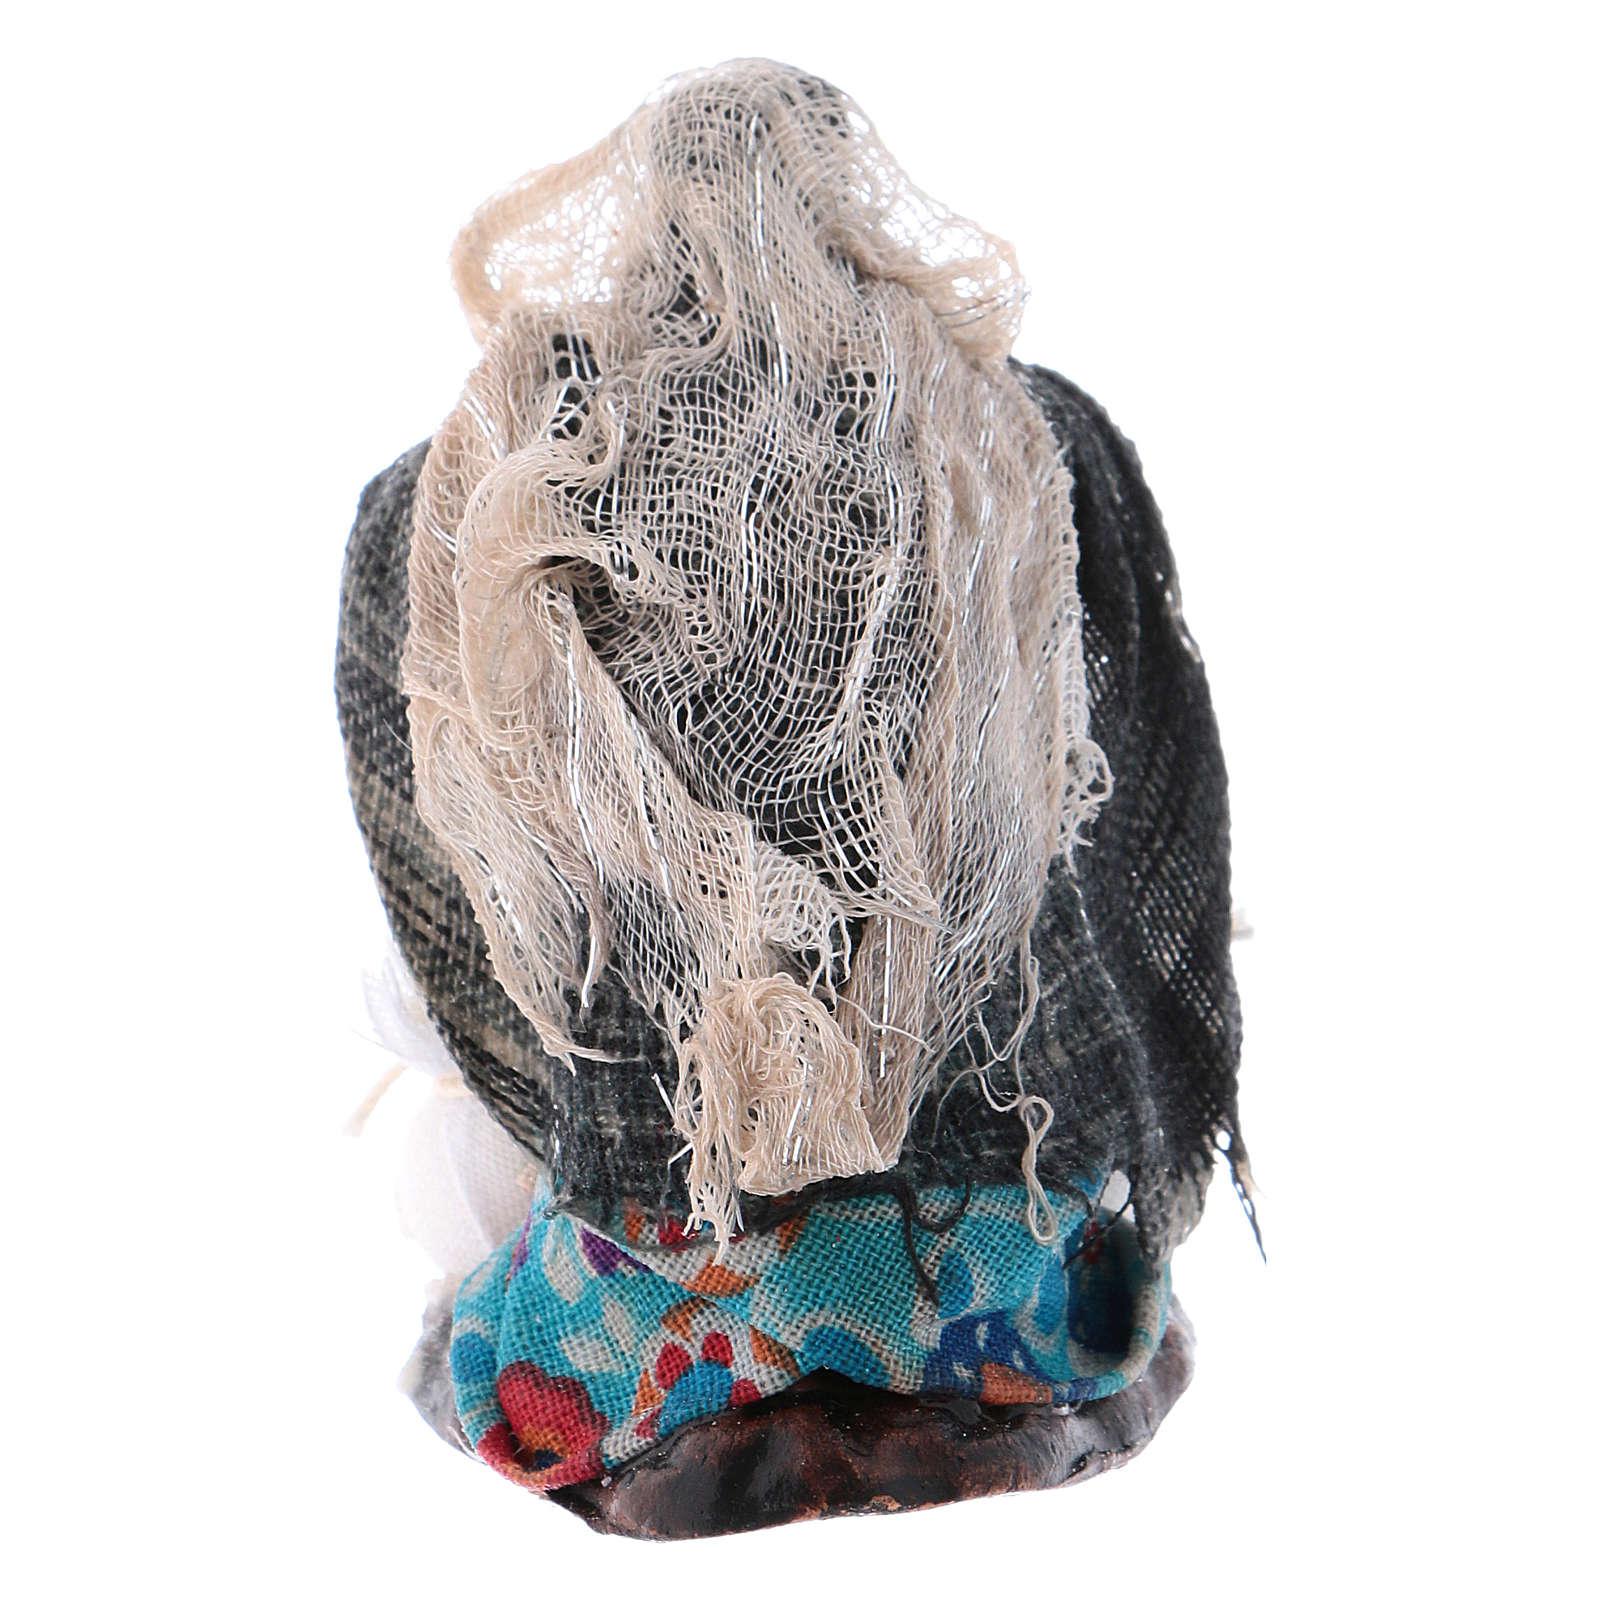 Mujer que amasa cm 8 pesebre napolitano 4